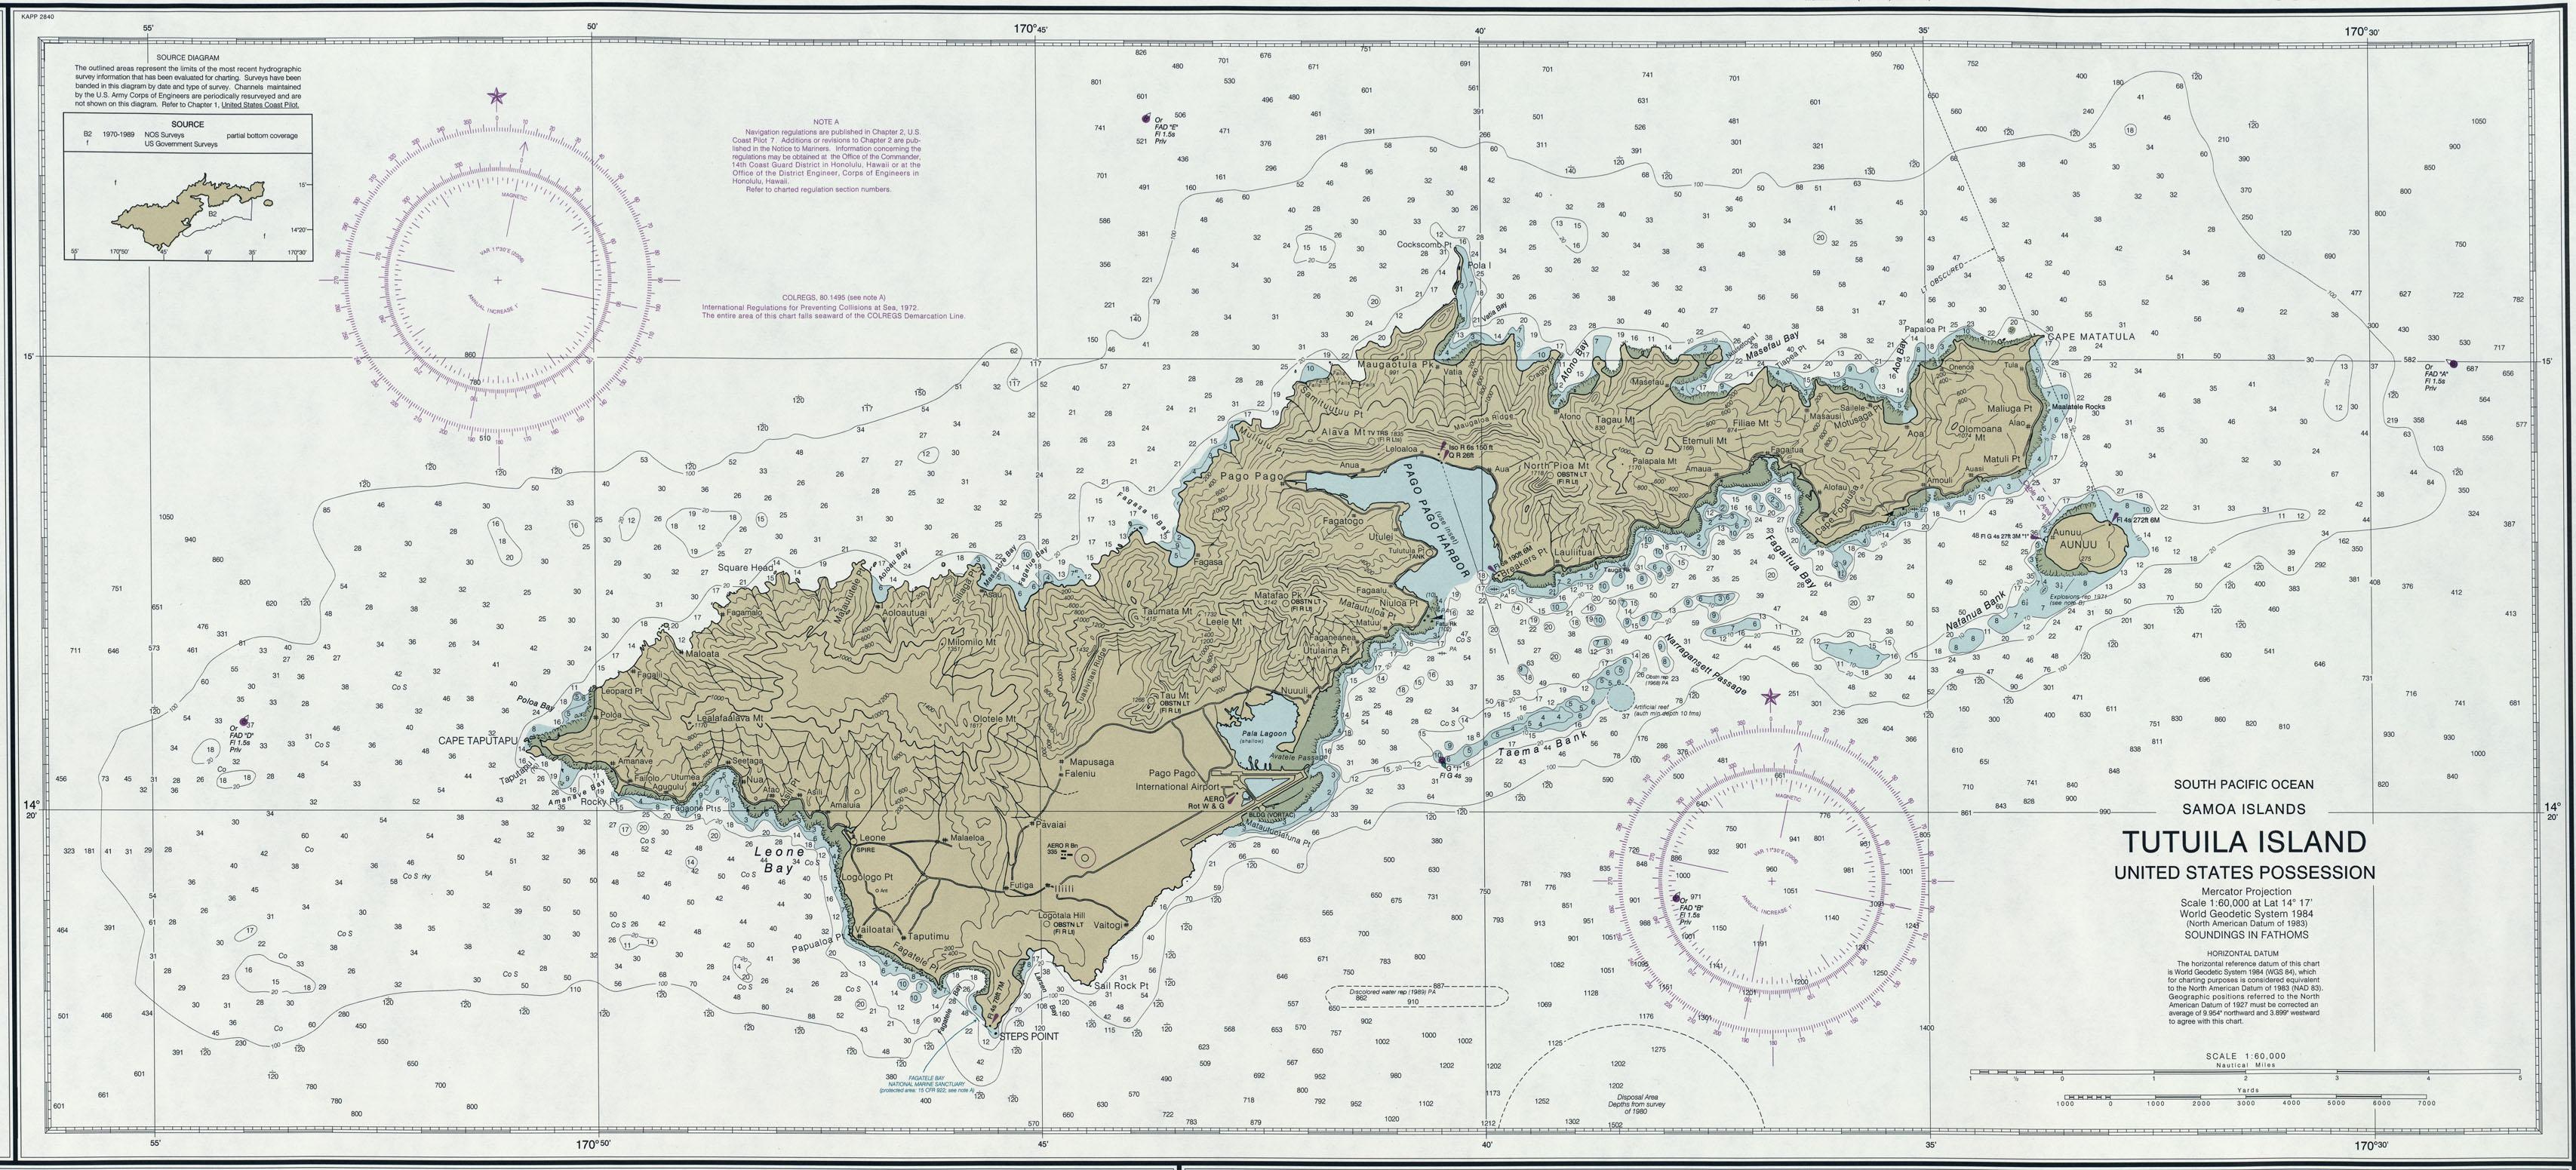 Tutuila Island Nautical Chart